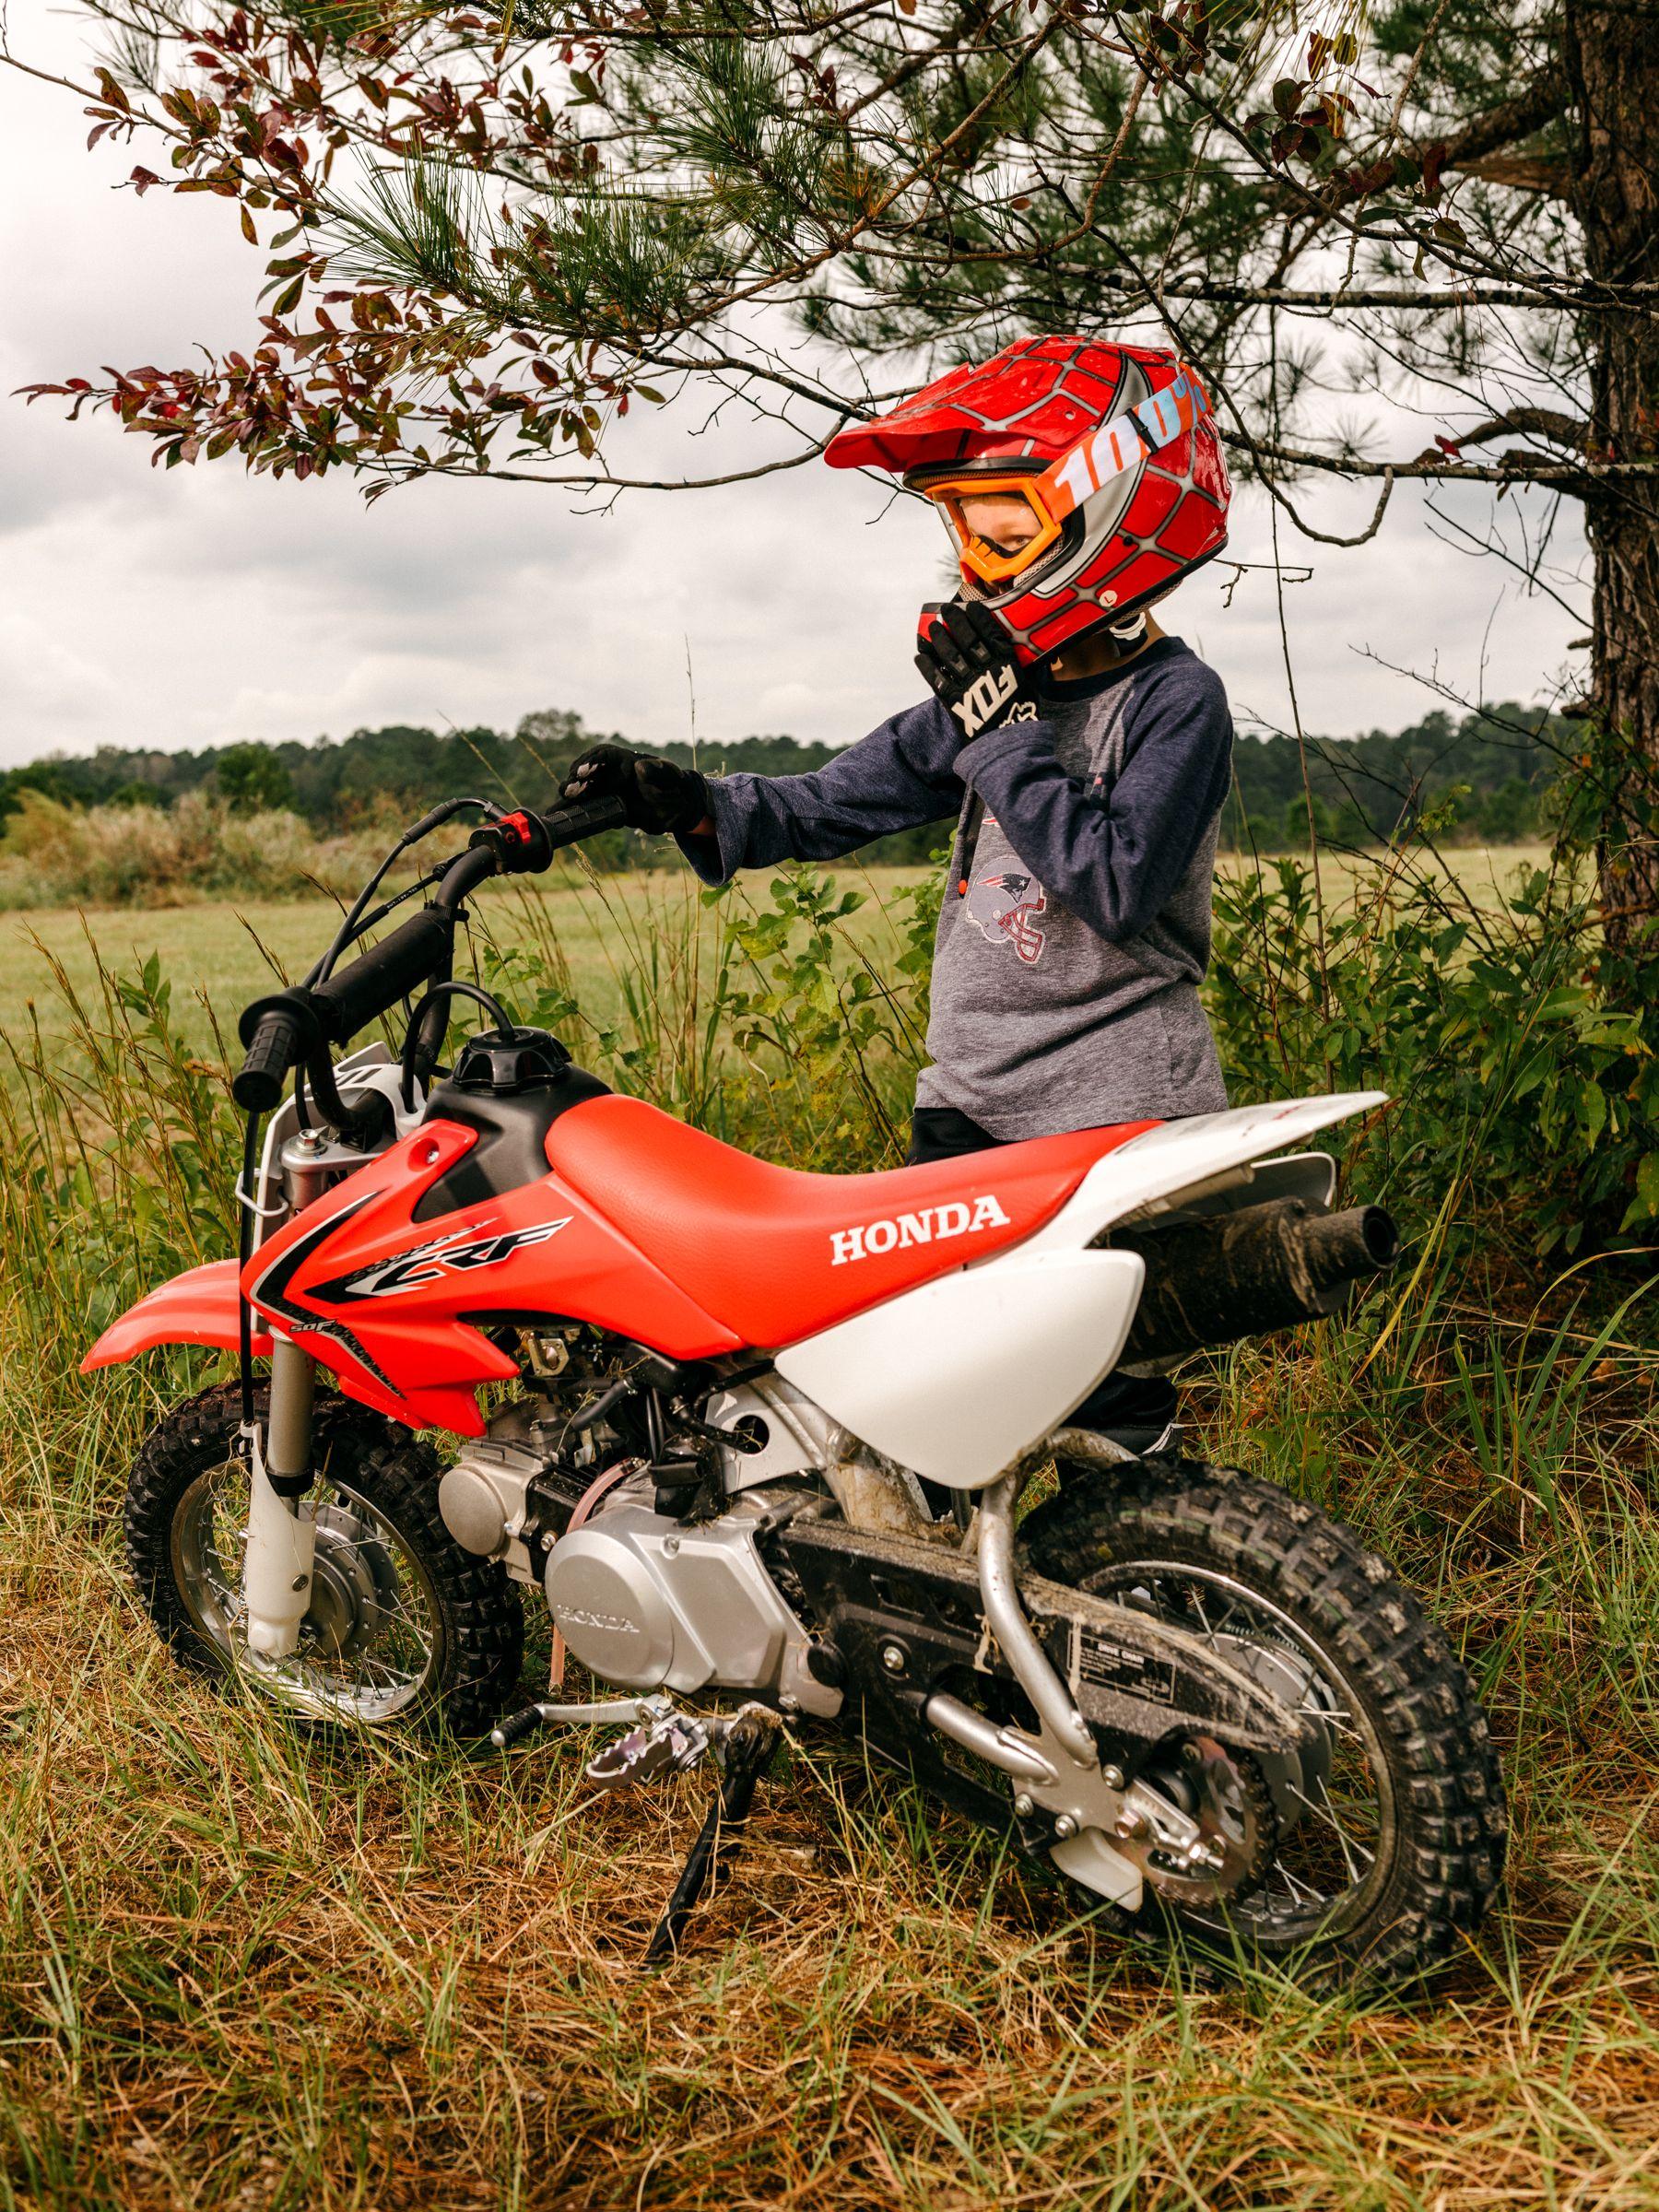 Type-1 Motorcycle Kickstarter